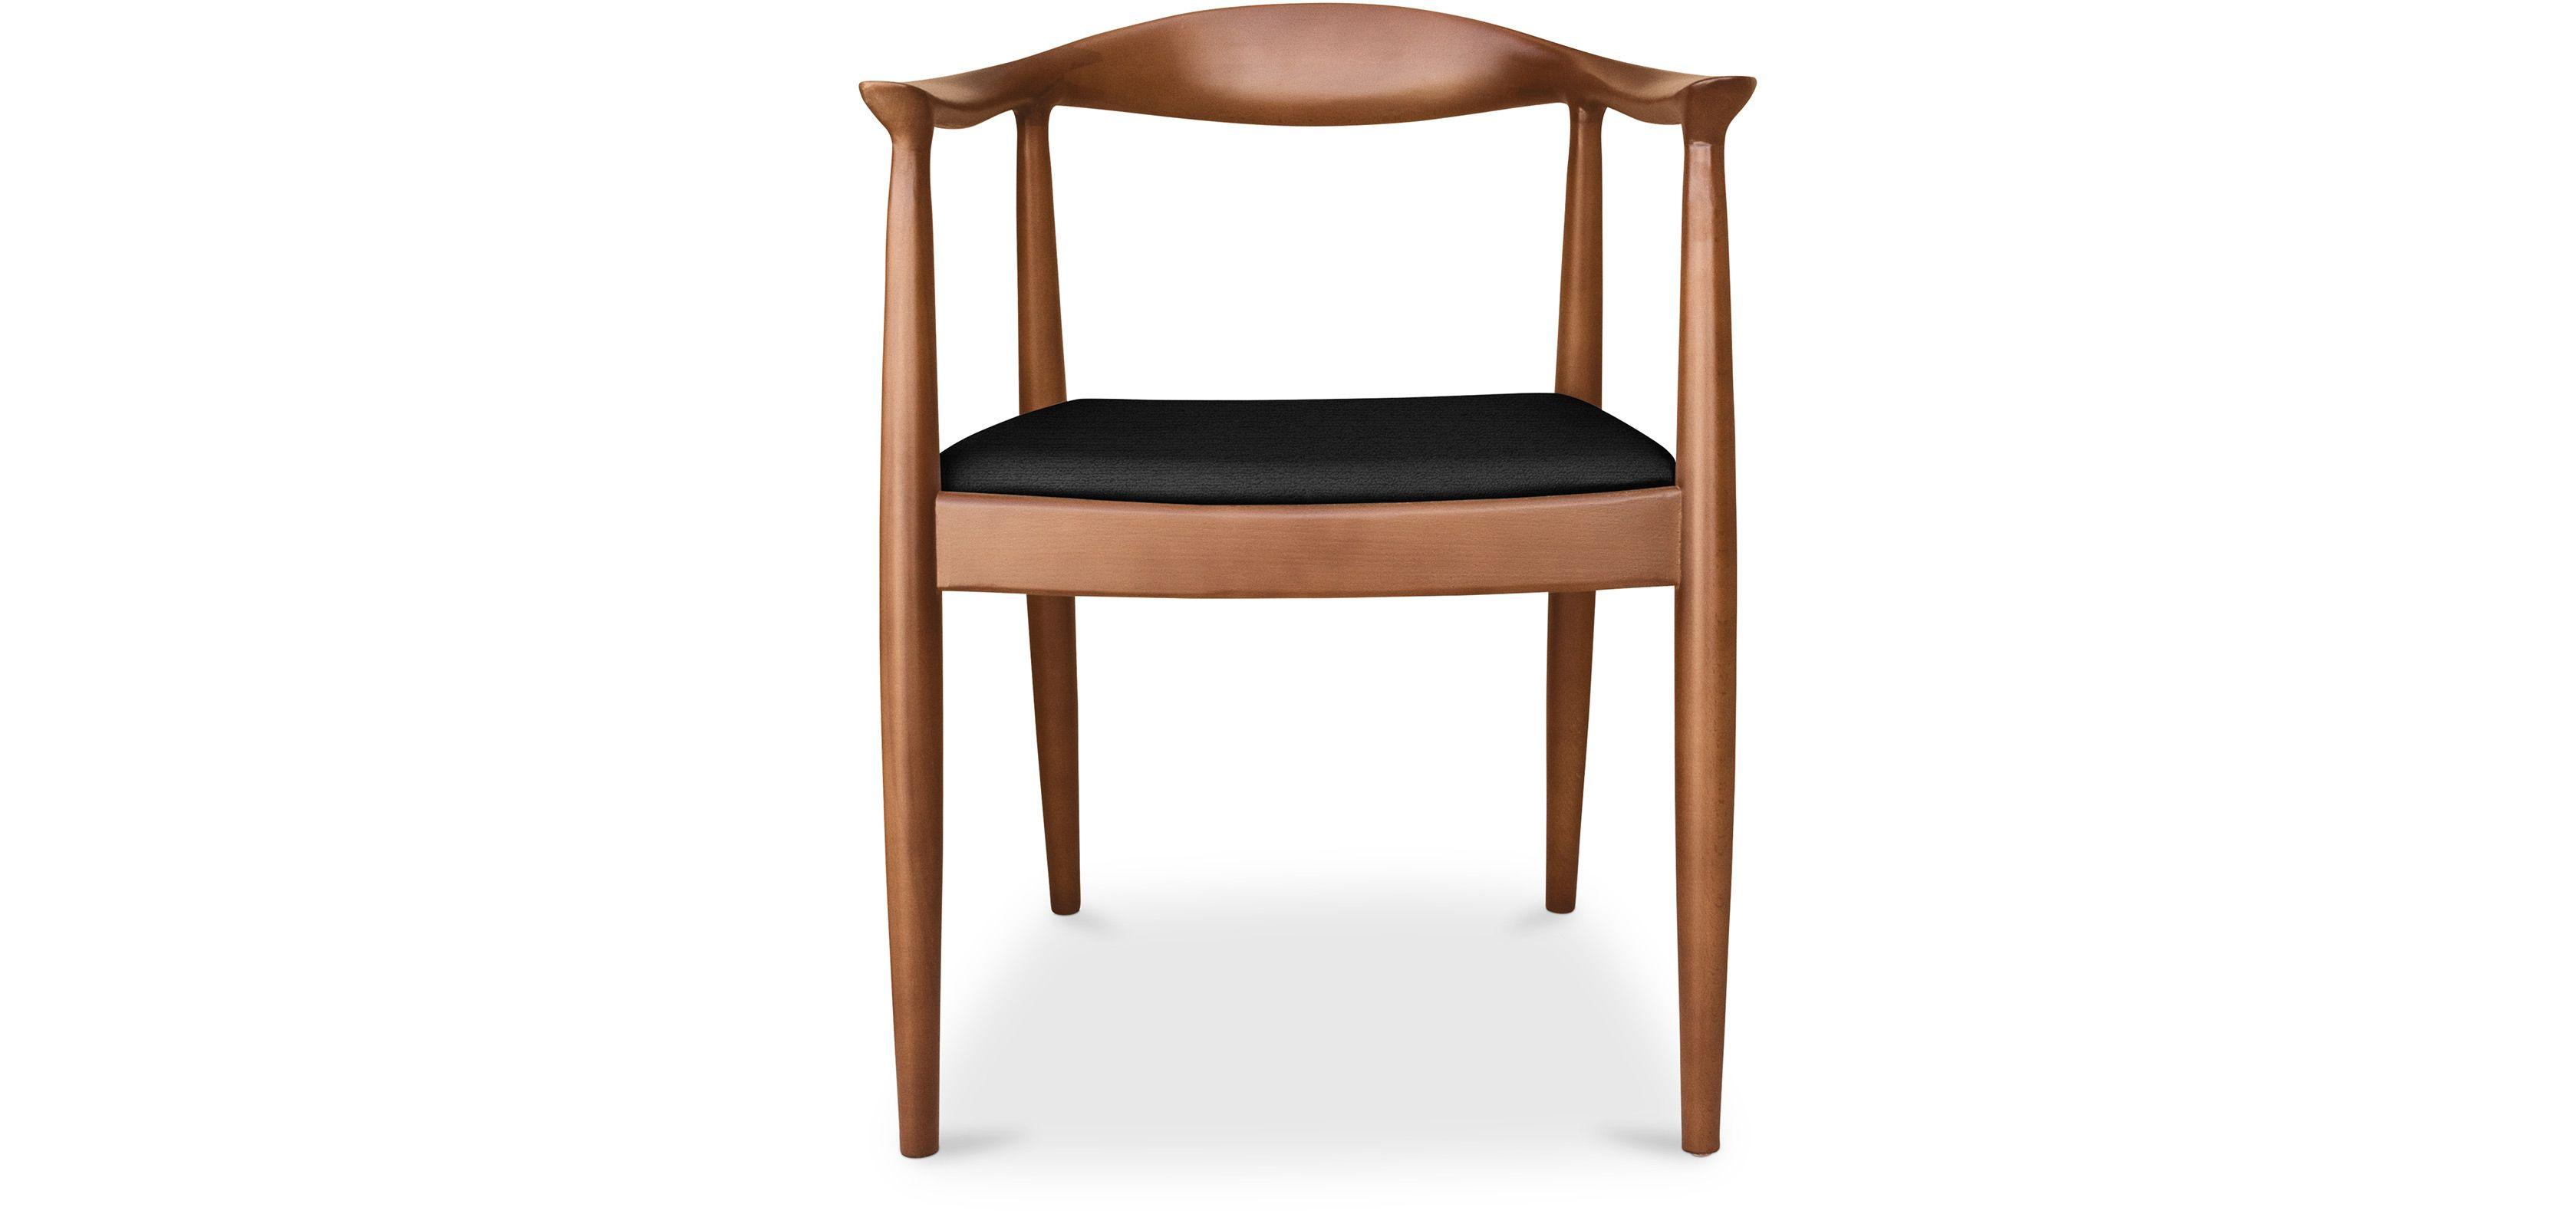 Chaise Design Scandinave The Chair Wegnerr Style Tissu Chaise Scandinave Chaise Design Mobilier Design